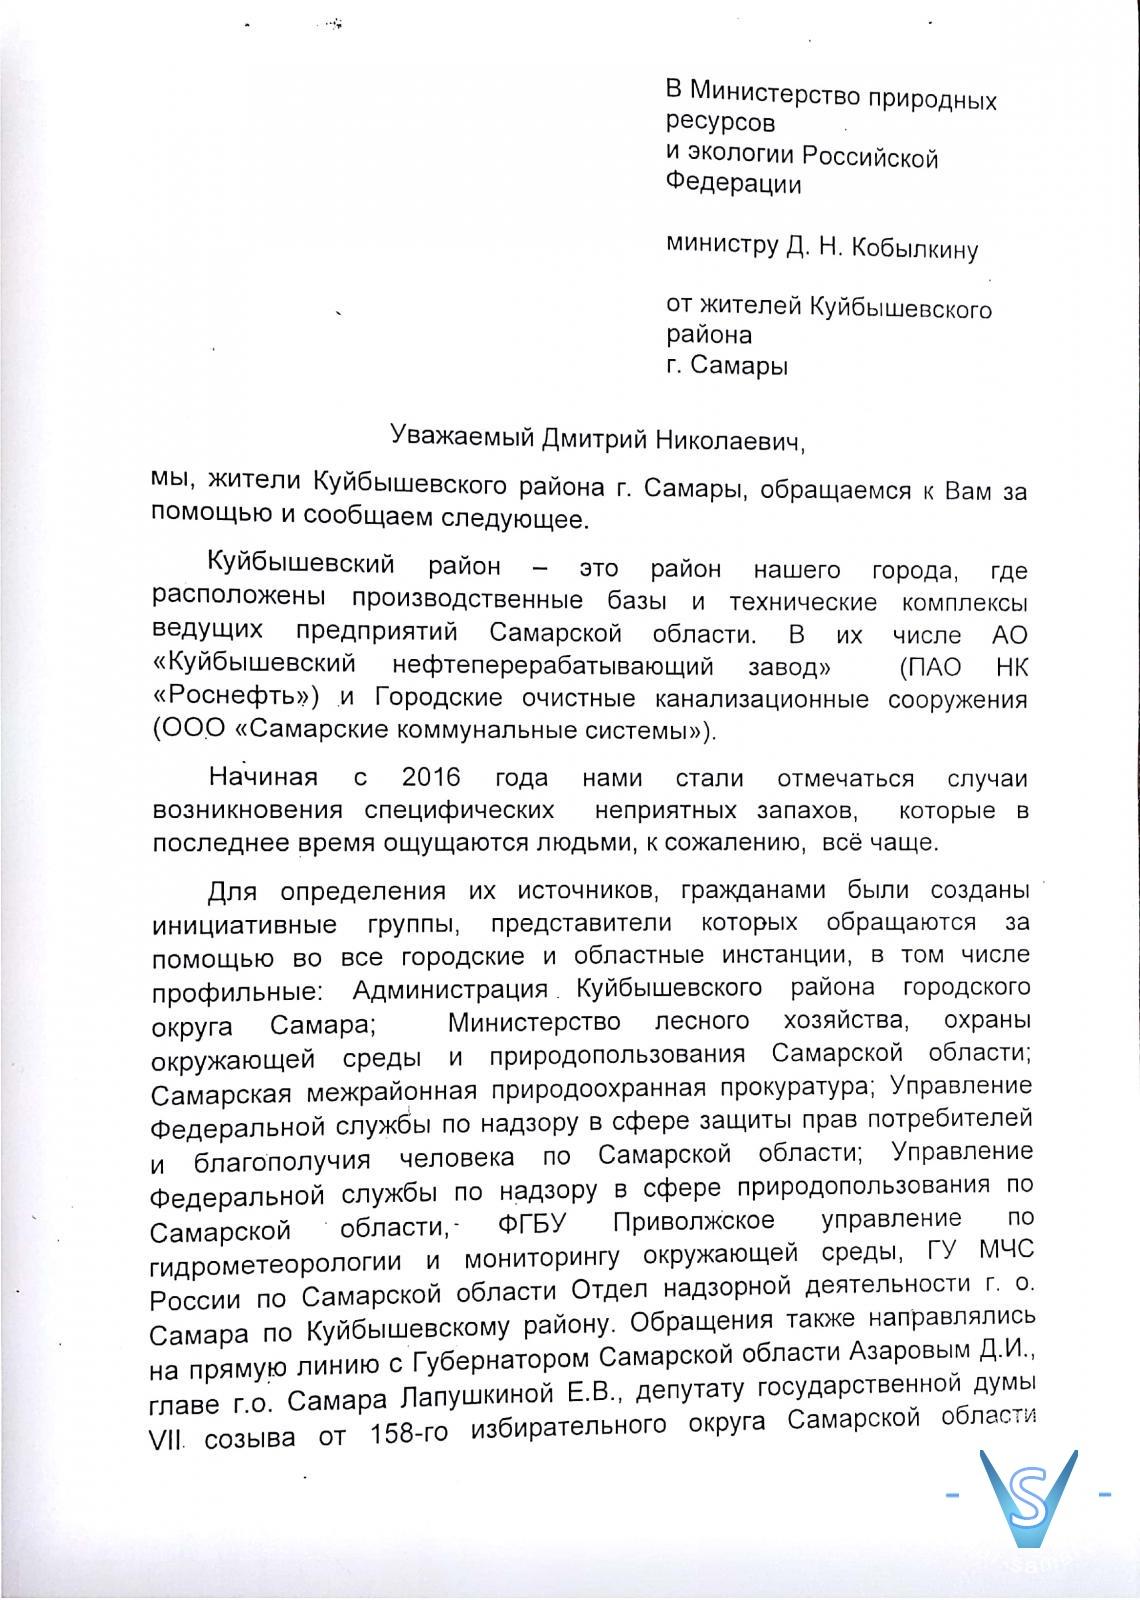 1Novy_dokument_2018-11-12_18_22_47_1.jpg